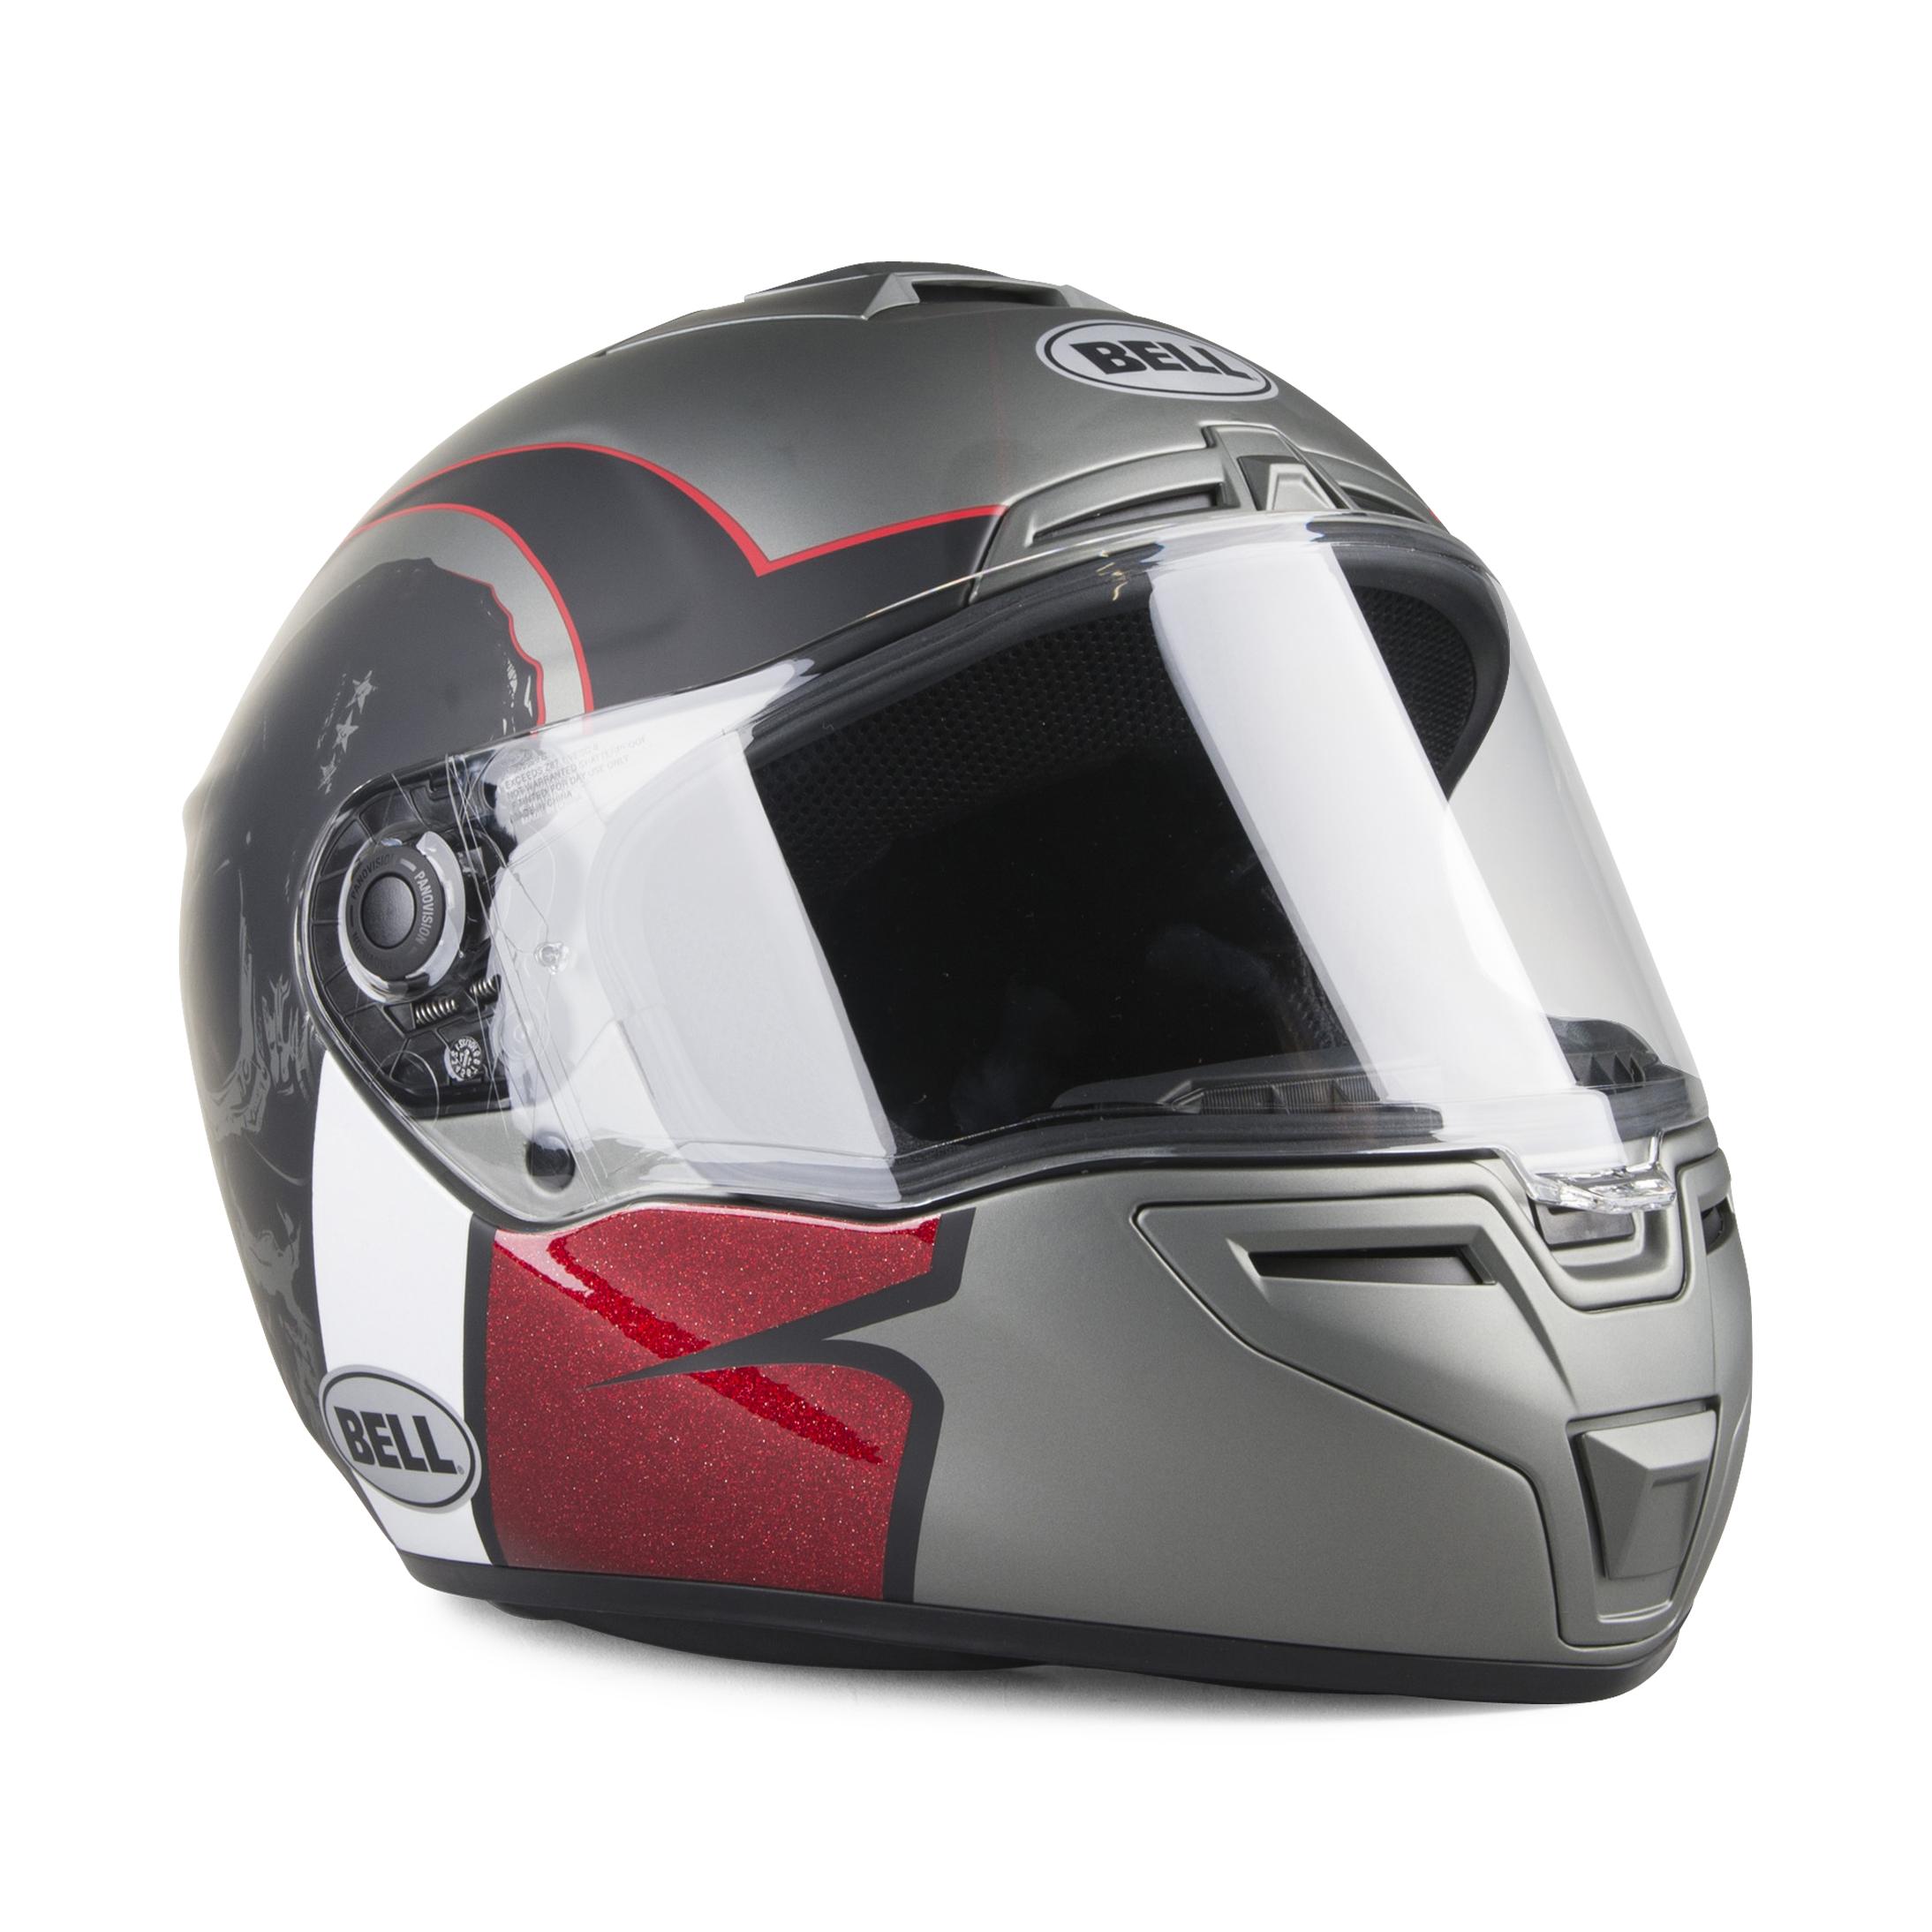 bell casco  srt carbone-bianco